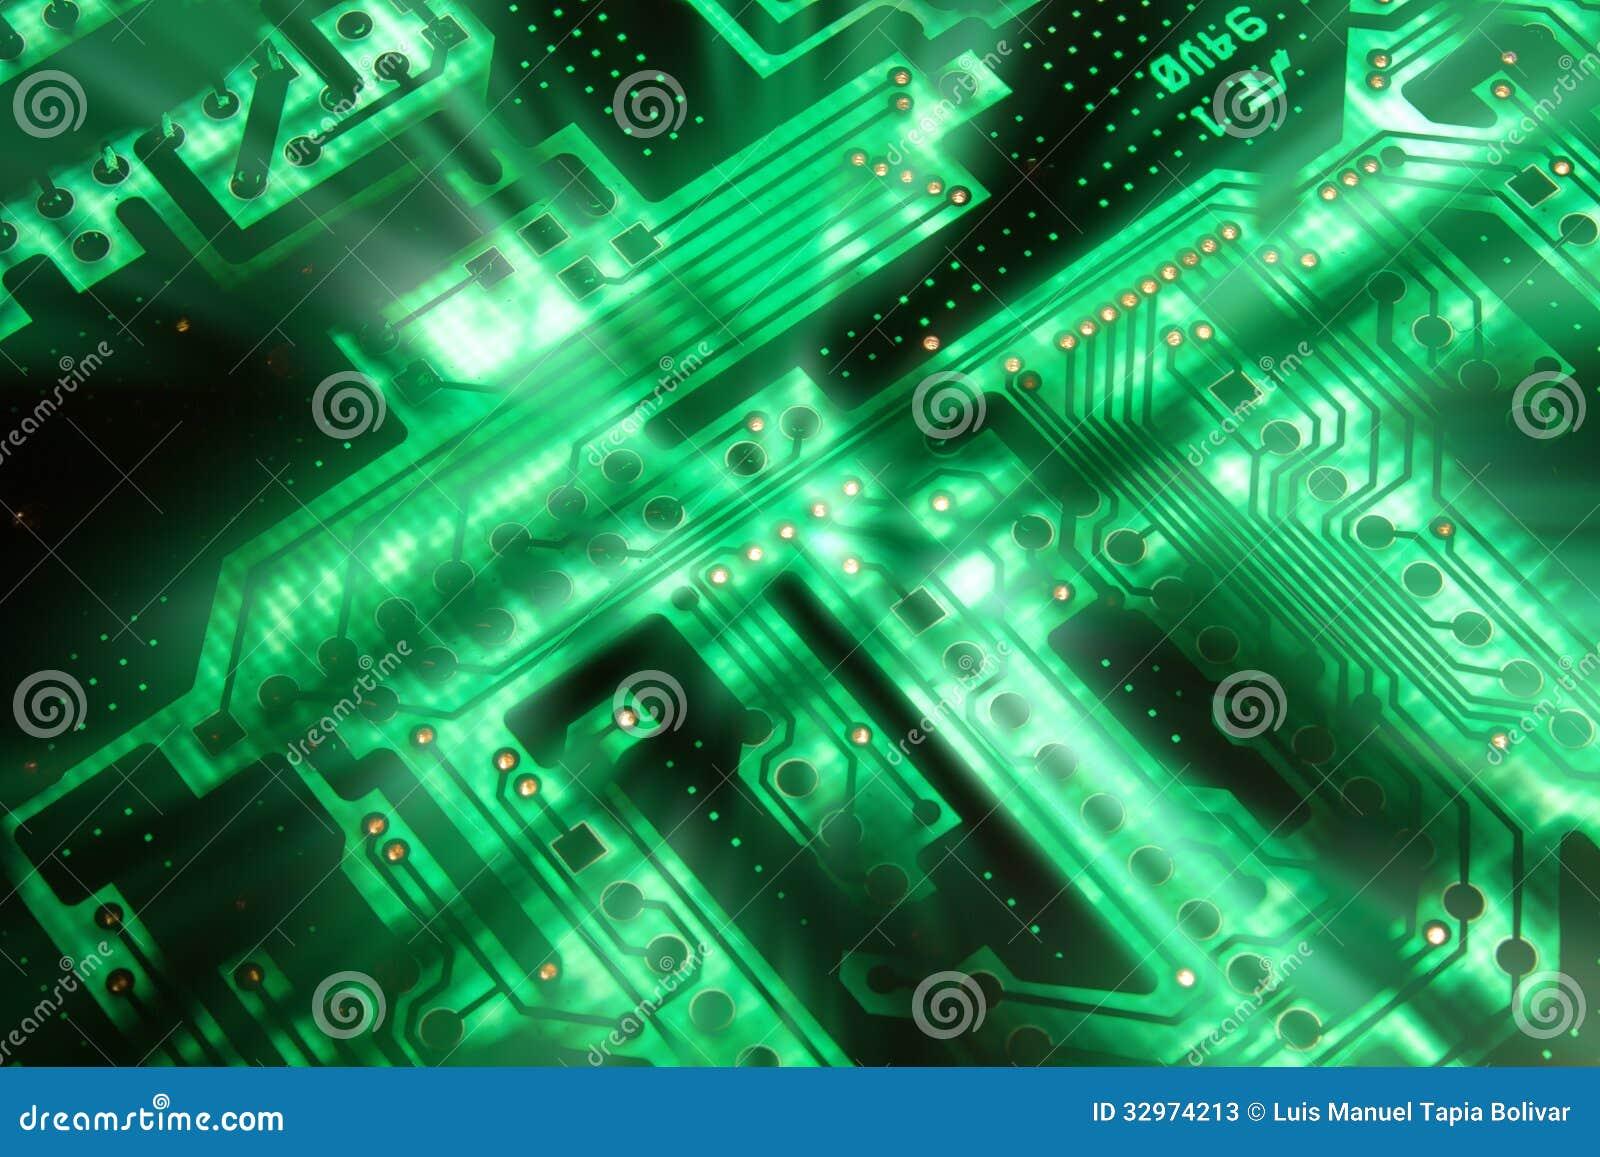 Circuito Z : Circuito elétrico fotos de stock imagem